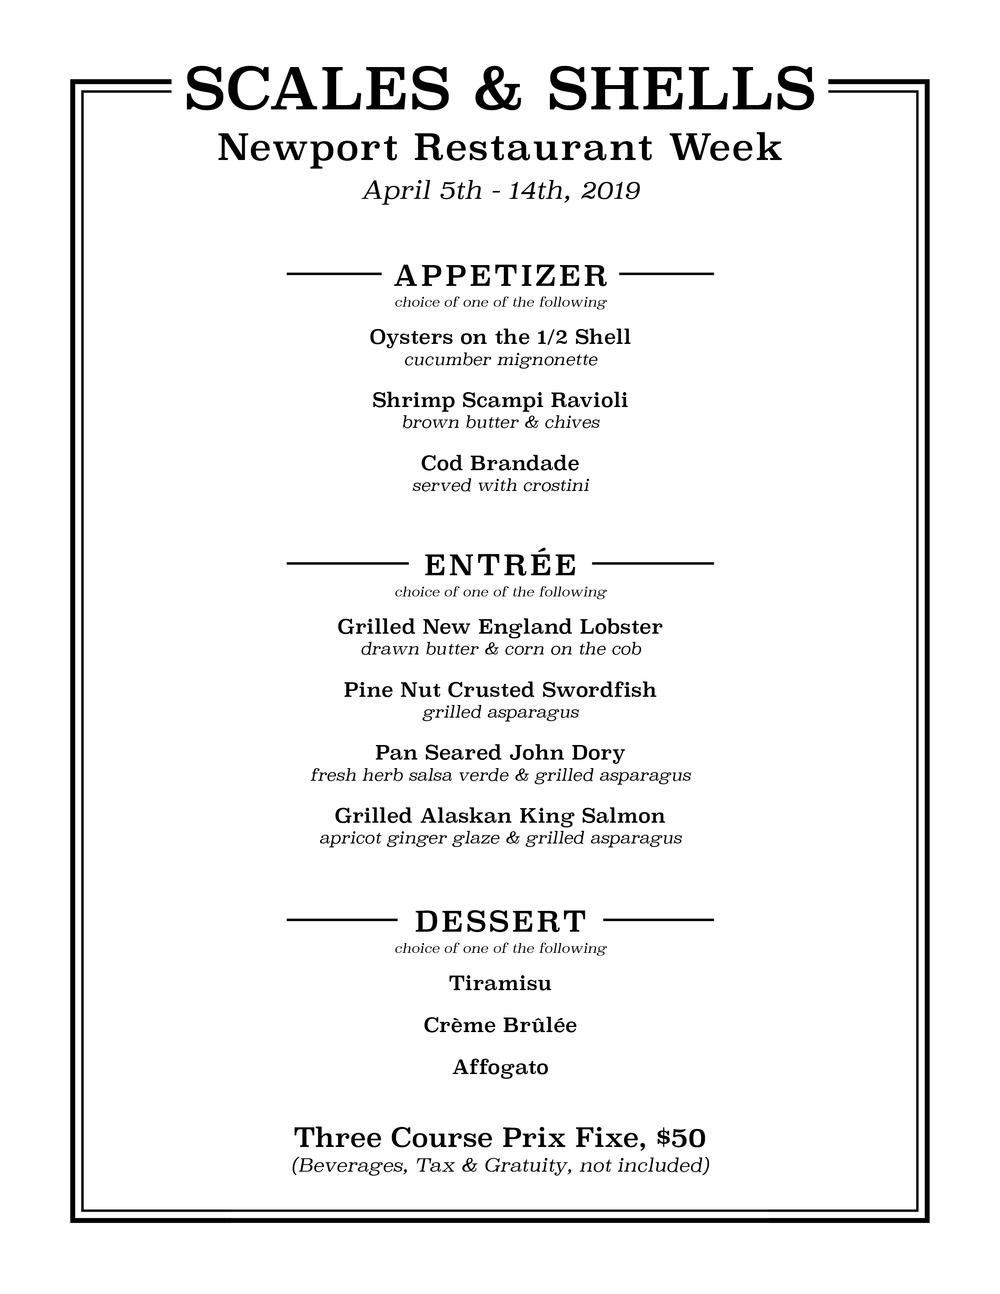 Newport Restaurant Week Menu - S19.png